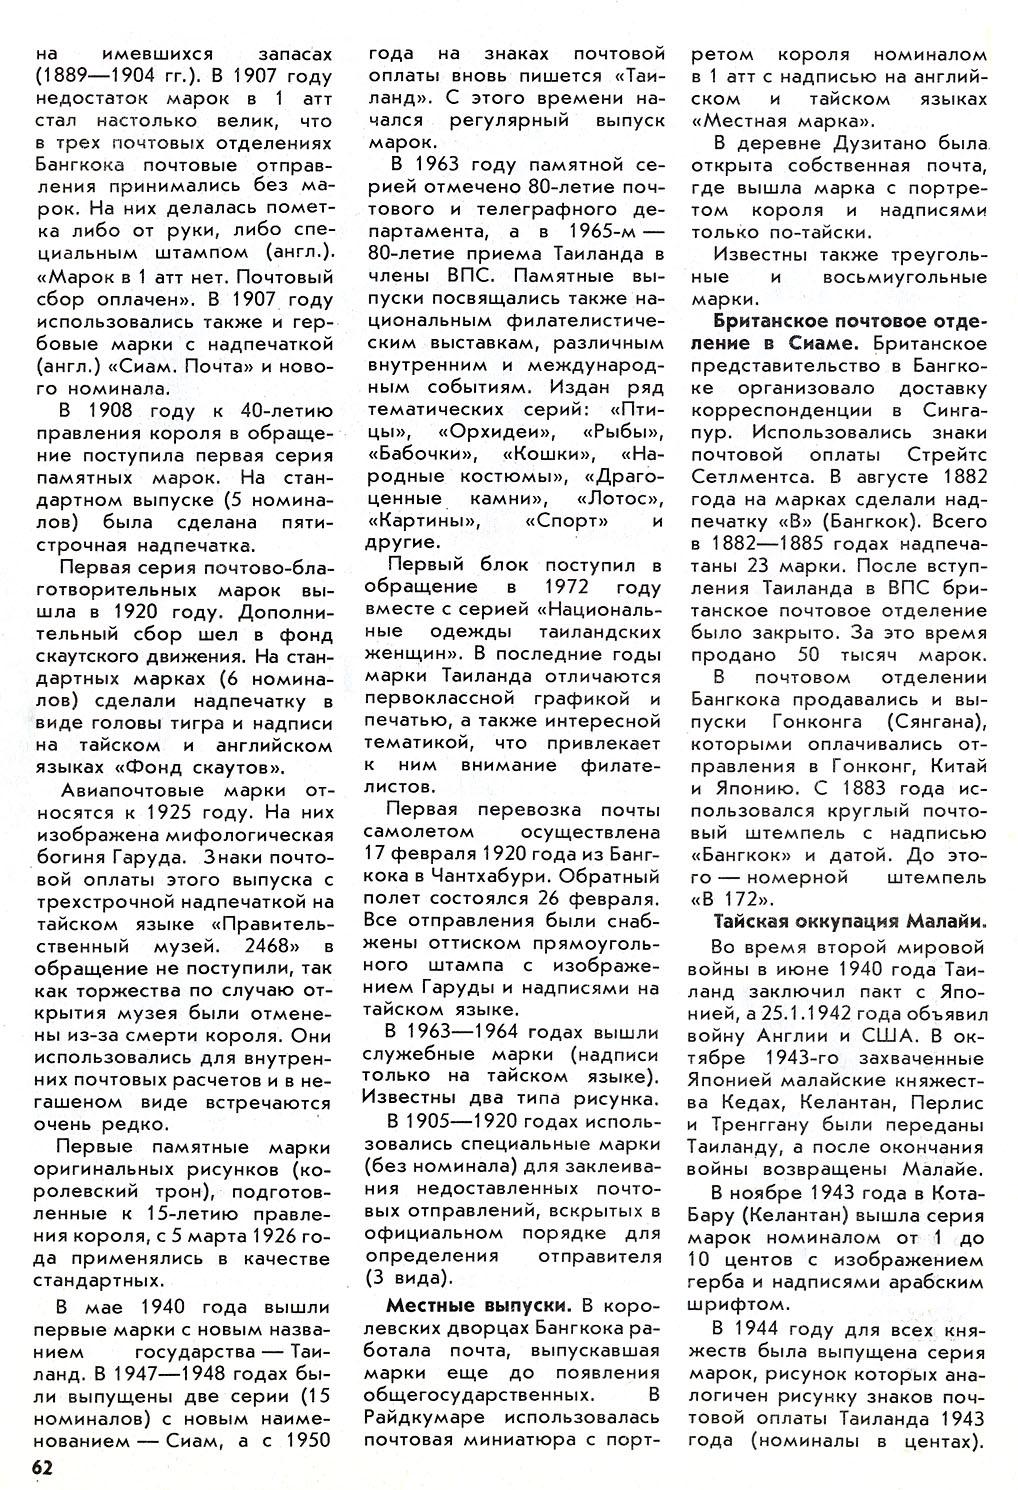 Fil_SSSR_1990_01_02.jpg